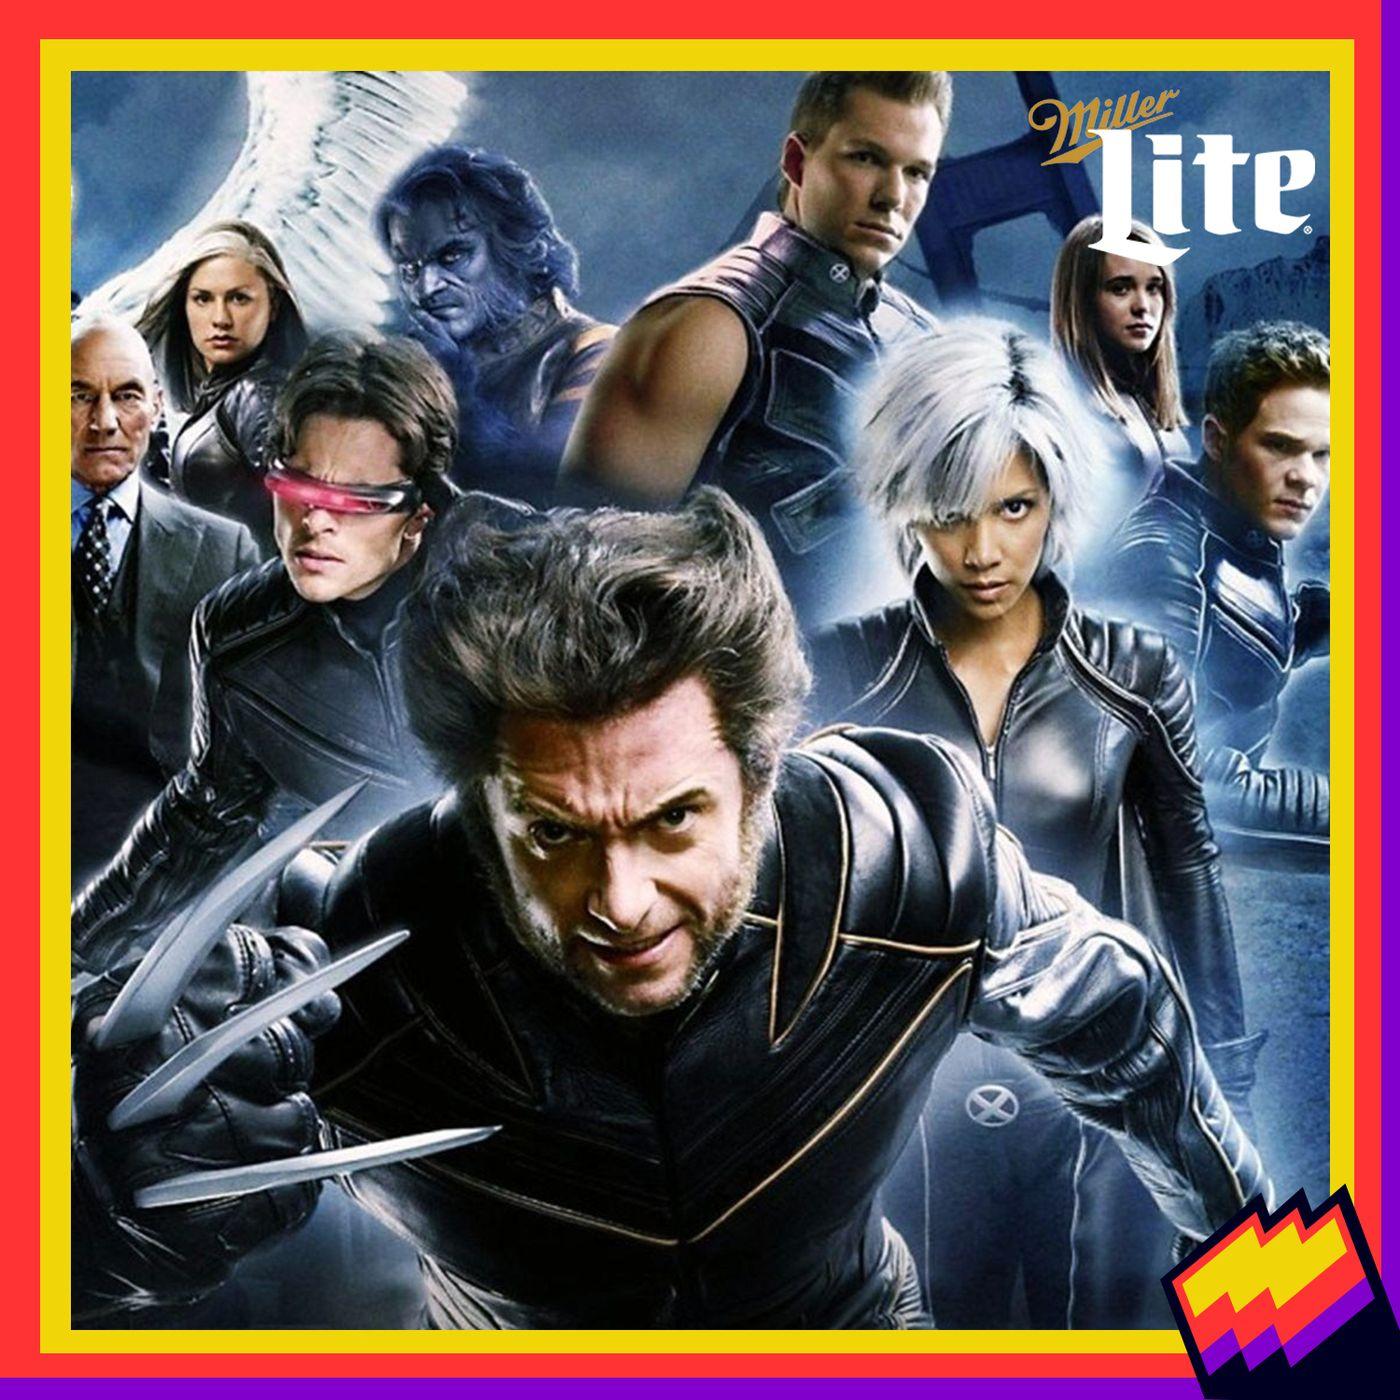 X-MEN: la trilogía original feat Miller Lite